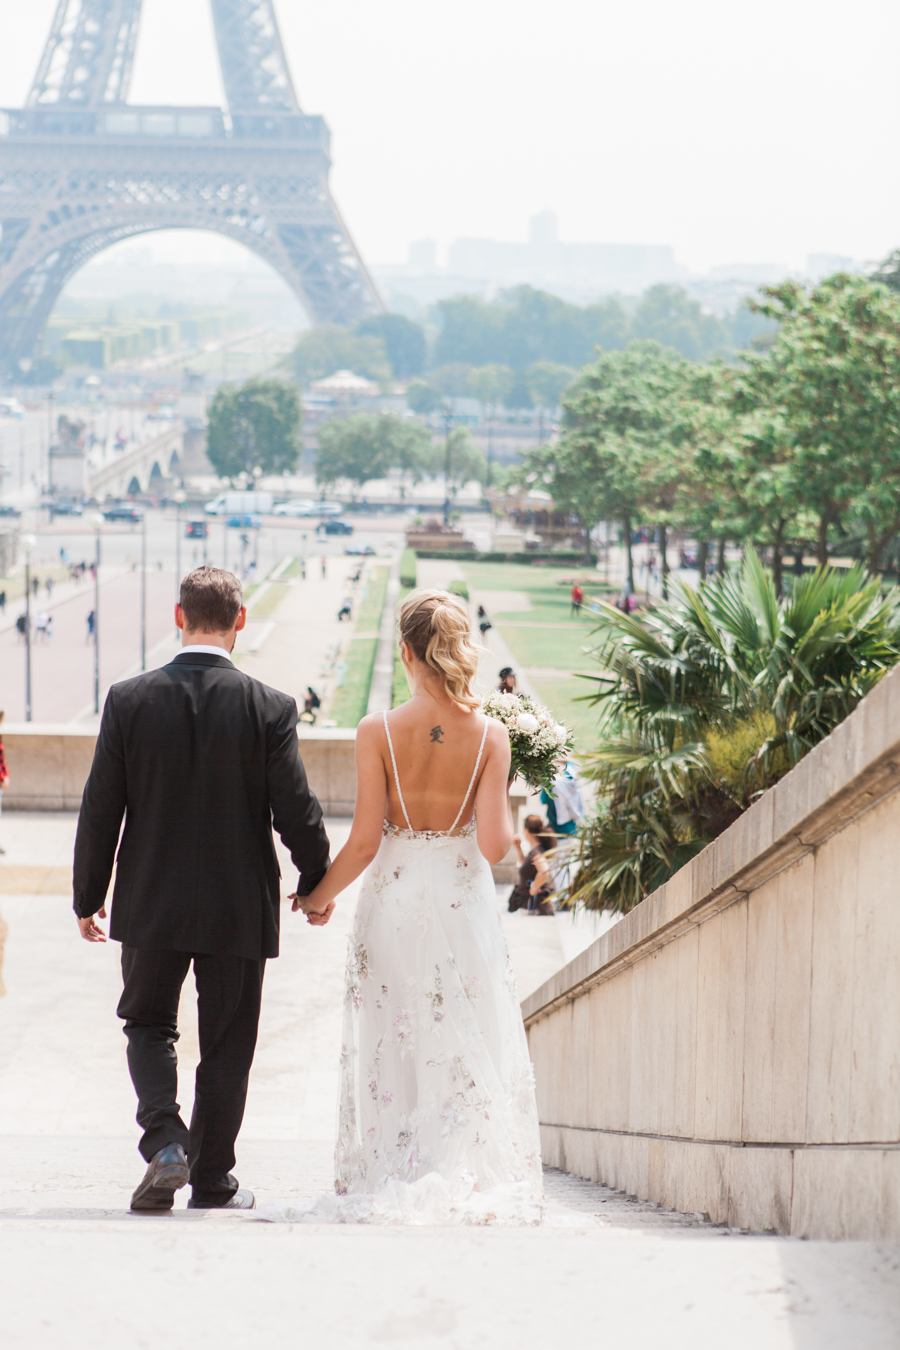 Paris destination wedding photography inspiration by Amanda Karen Photography